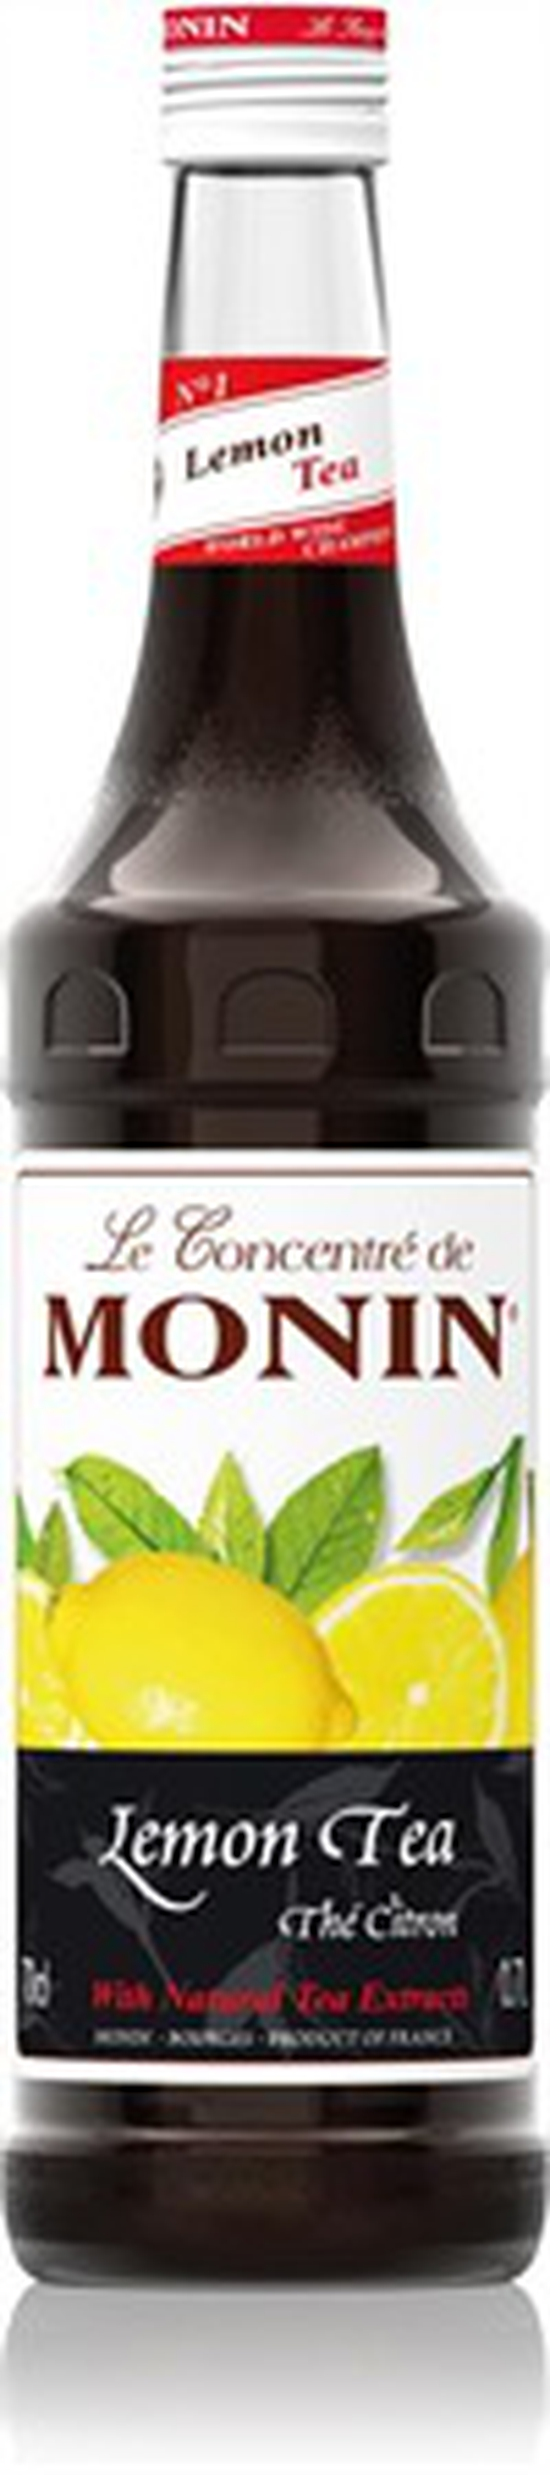 Sirô Trà Chanh (Lemon Tea) hiệu Monin-chai 700ml